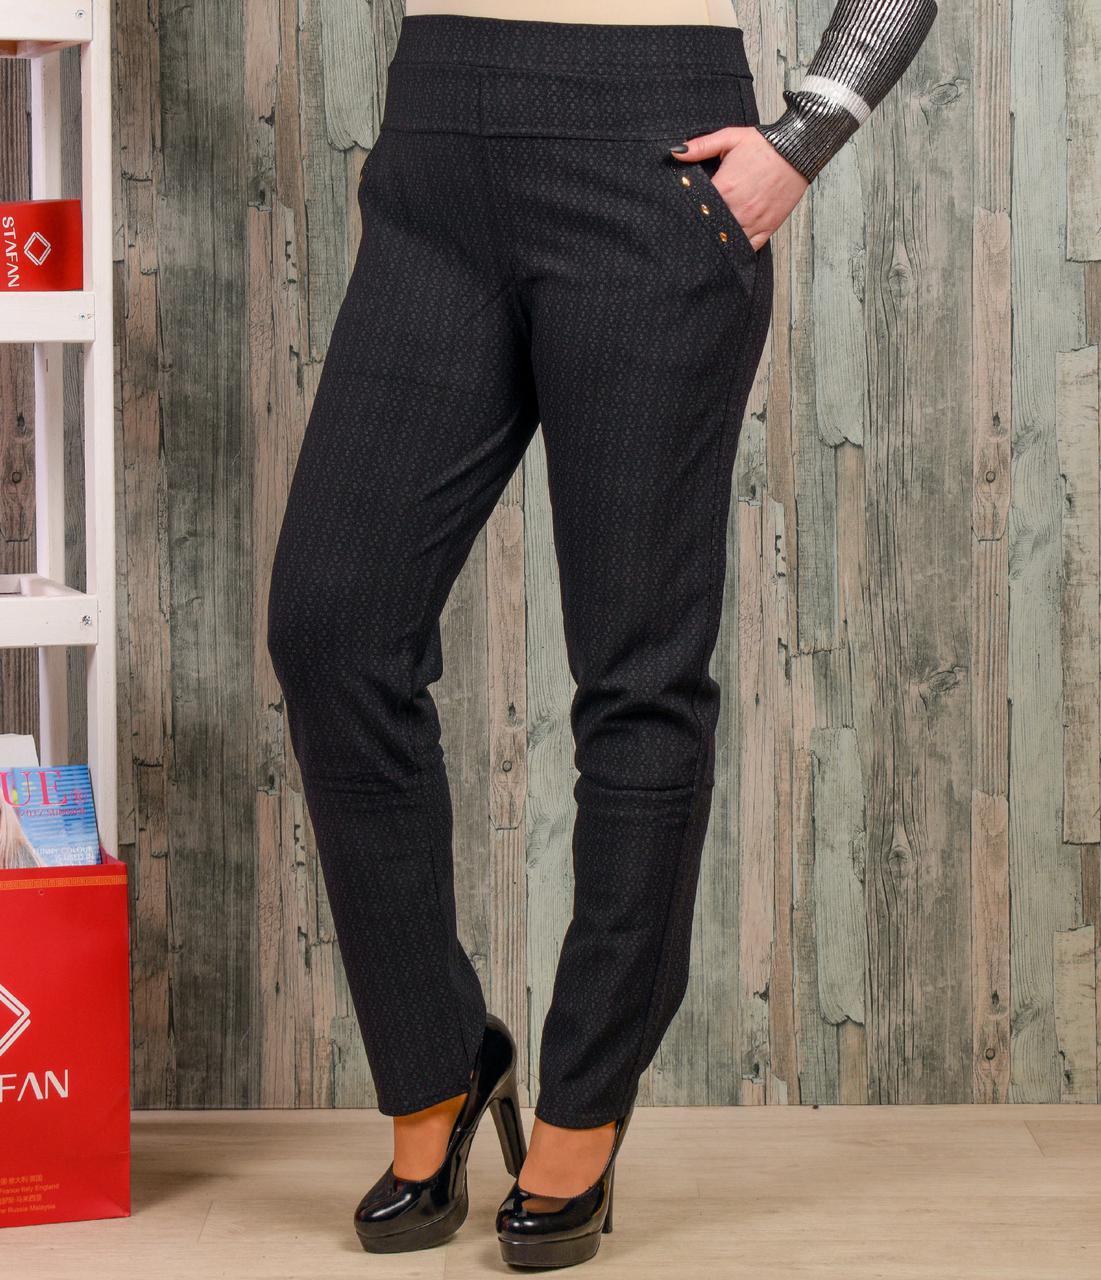 Женские брюки со стразиками на карманах Алия 1211-21 3XL-4XL. Размер 5